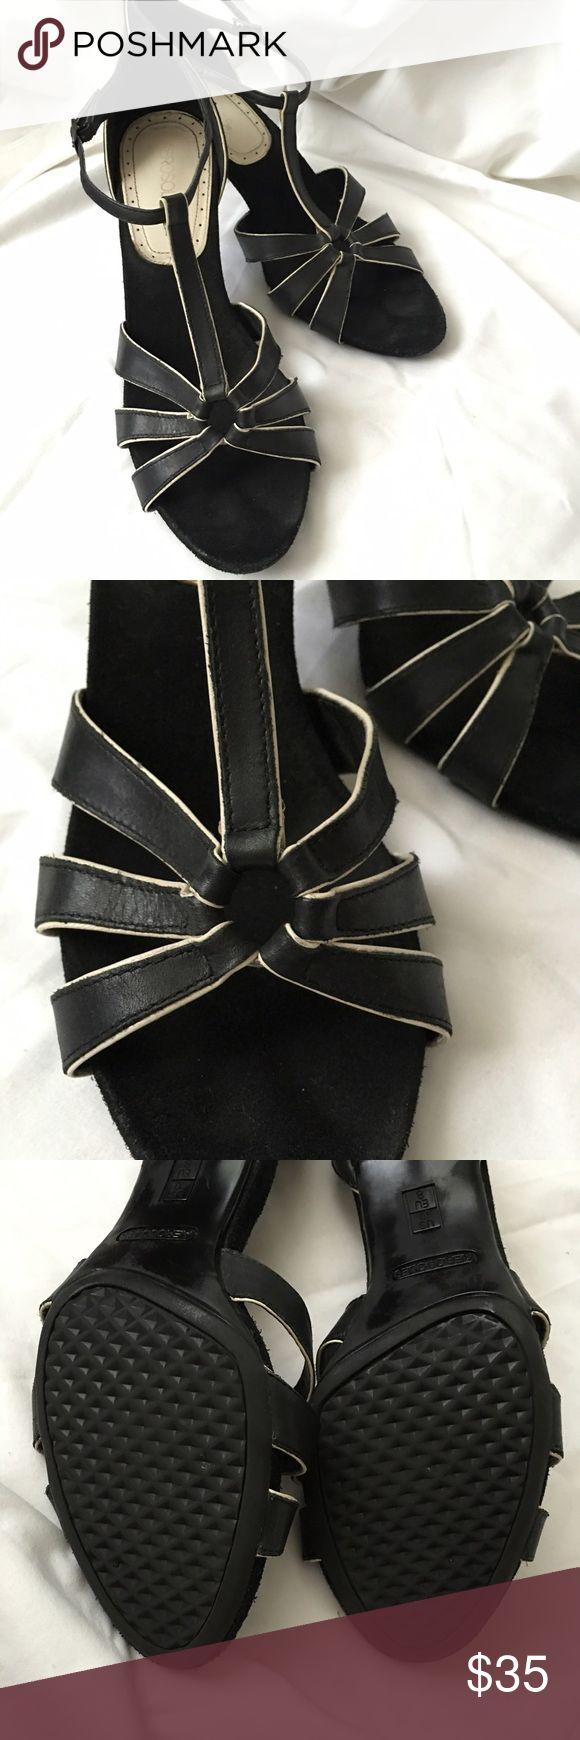 "Aerosols black and cream strappy heels Gorgeous black and cream heels, only worn a few times. 2 1/2"" heels AEROSOLES Shoes Heels"